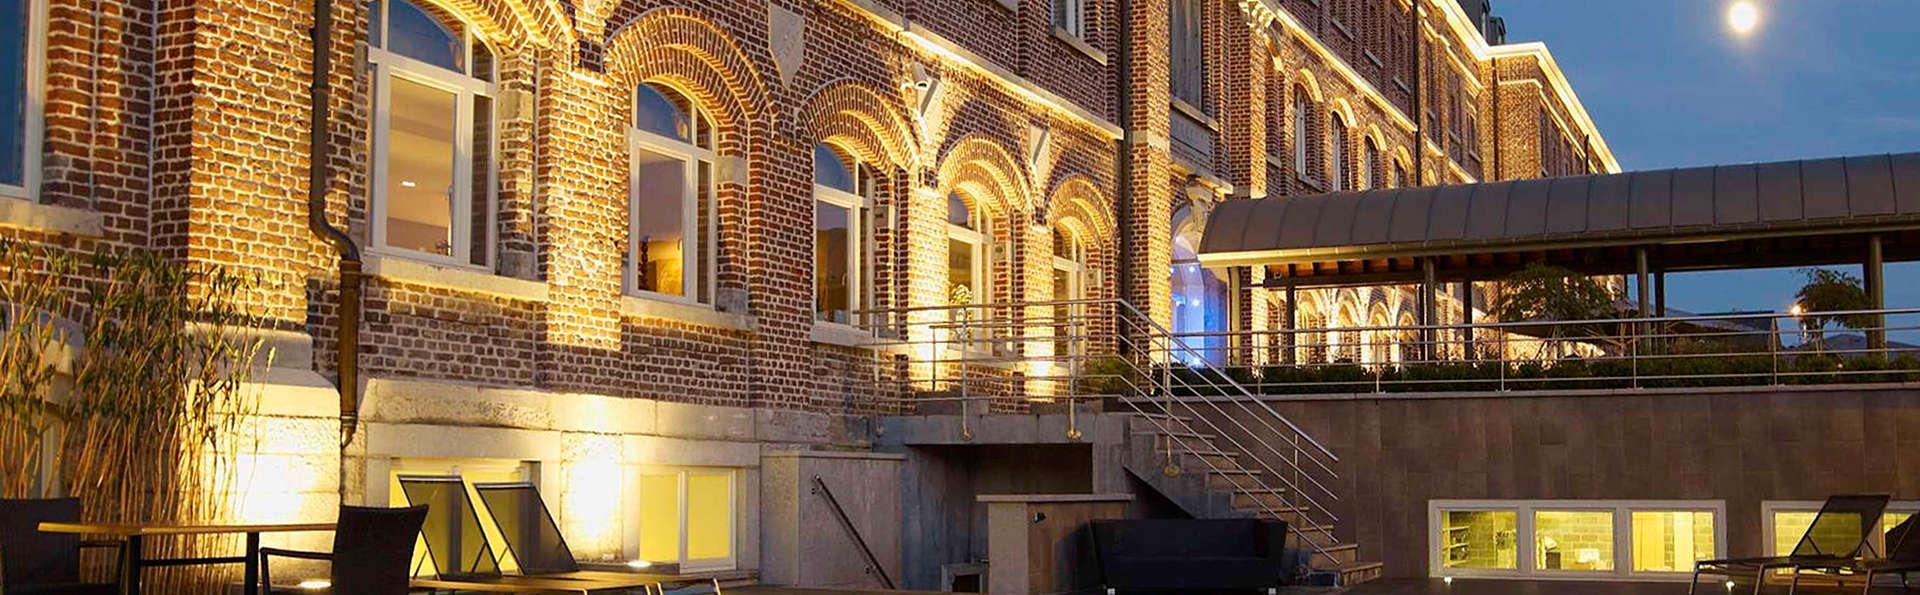 Van der Valk Hotel Verviers - edit_pool_facade.jpg